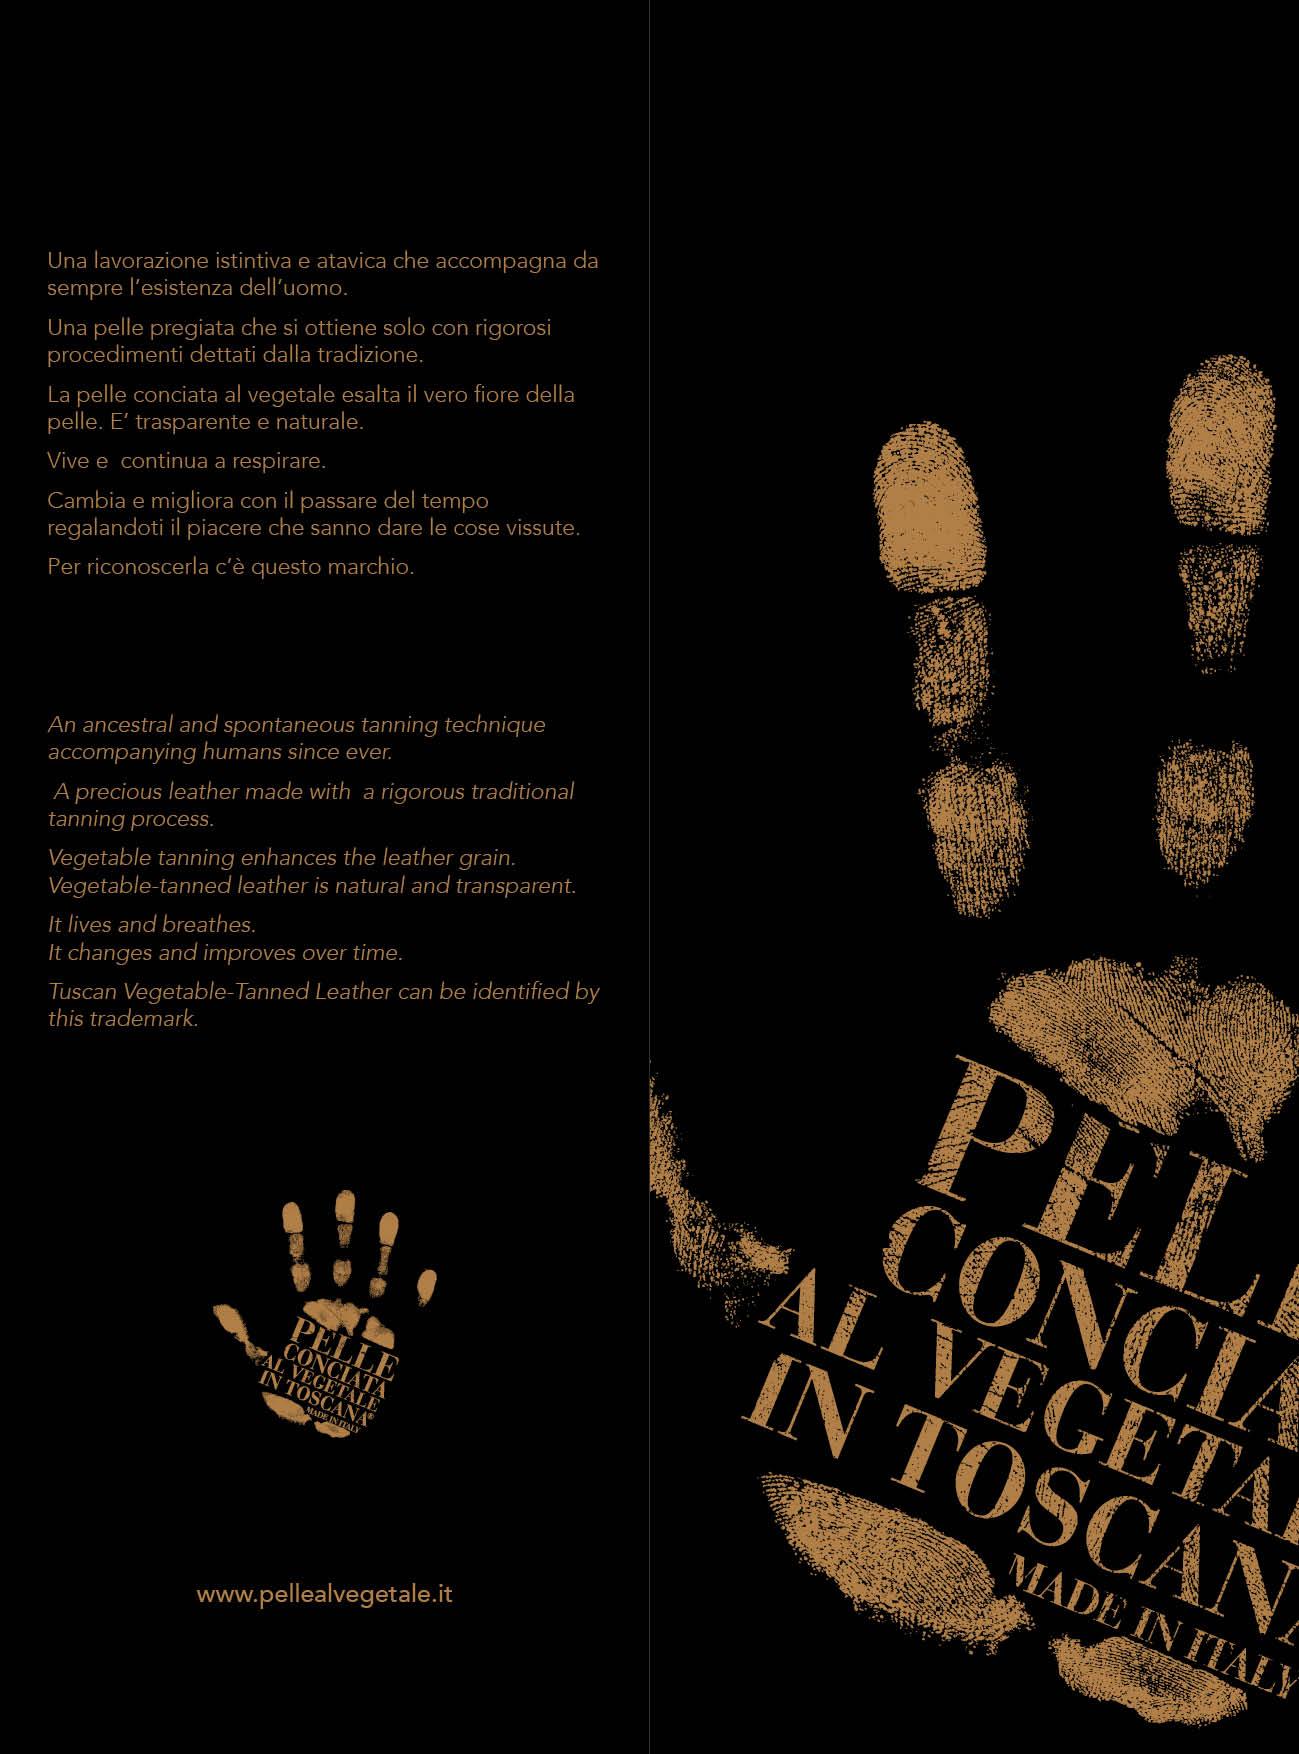 ConsorzioVeraPelleAlVegetale-esterno